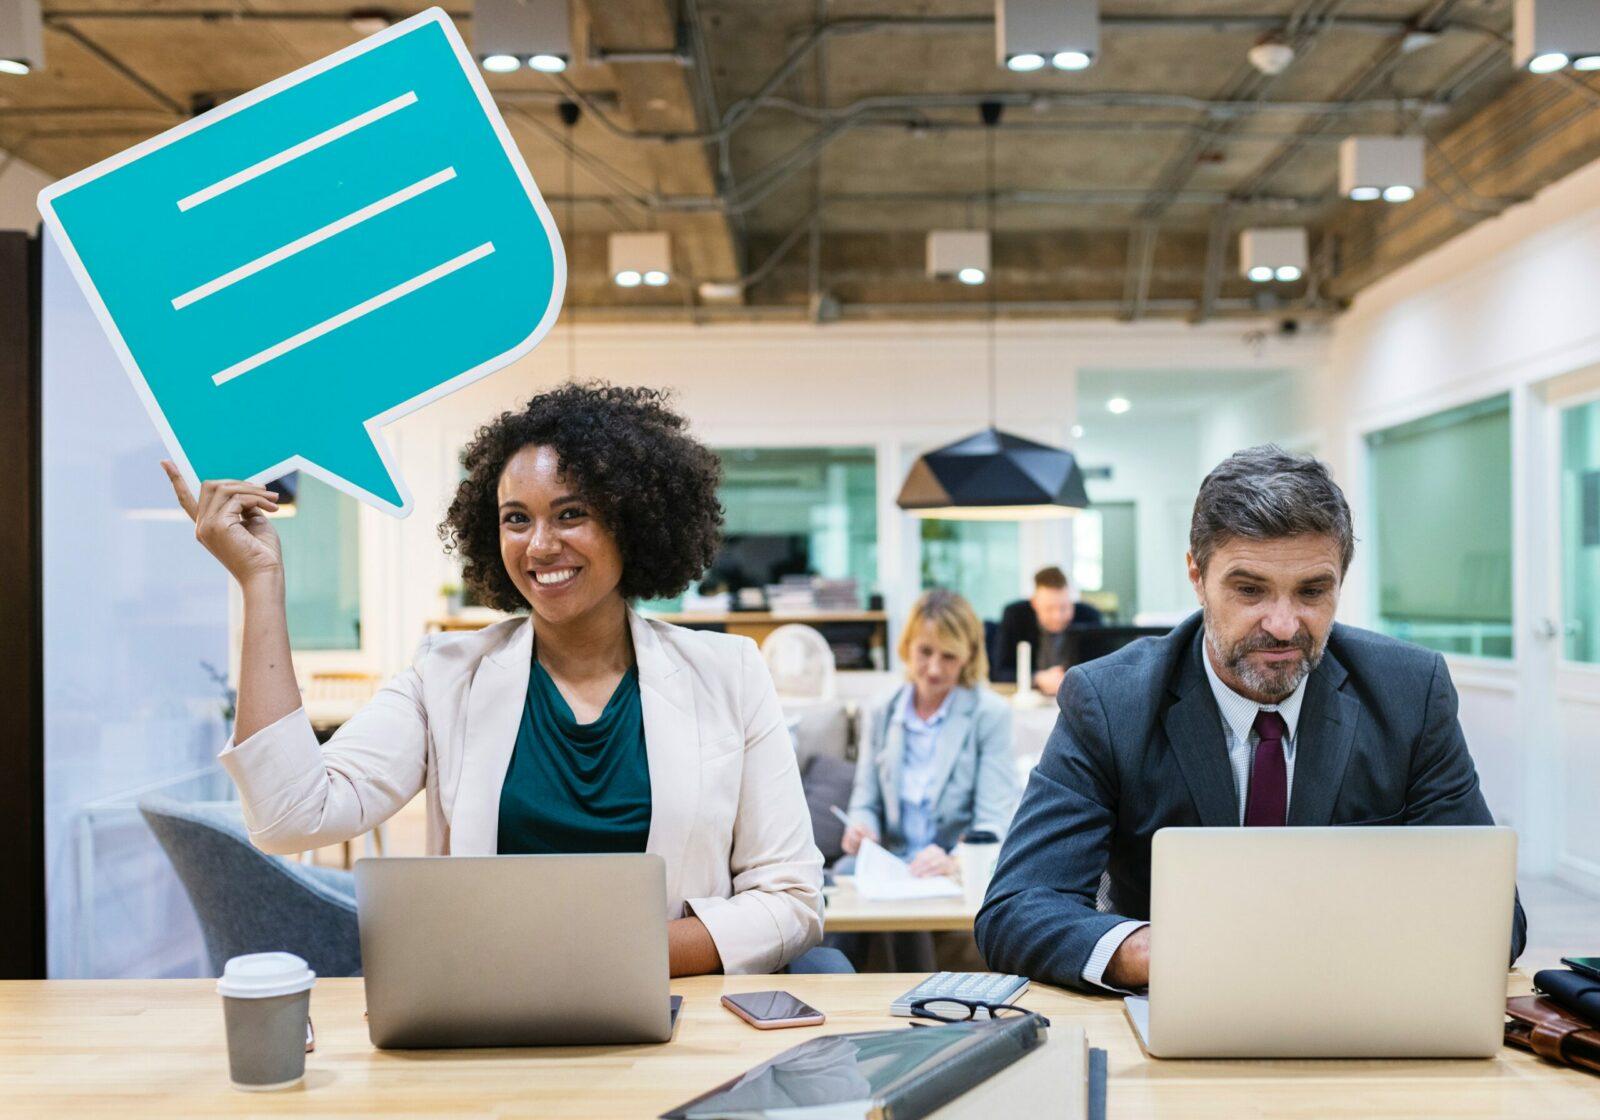 10 veel voorkomende social media fouten